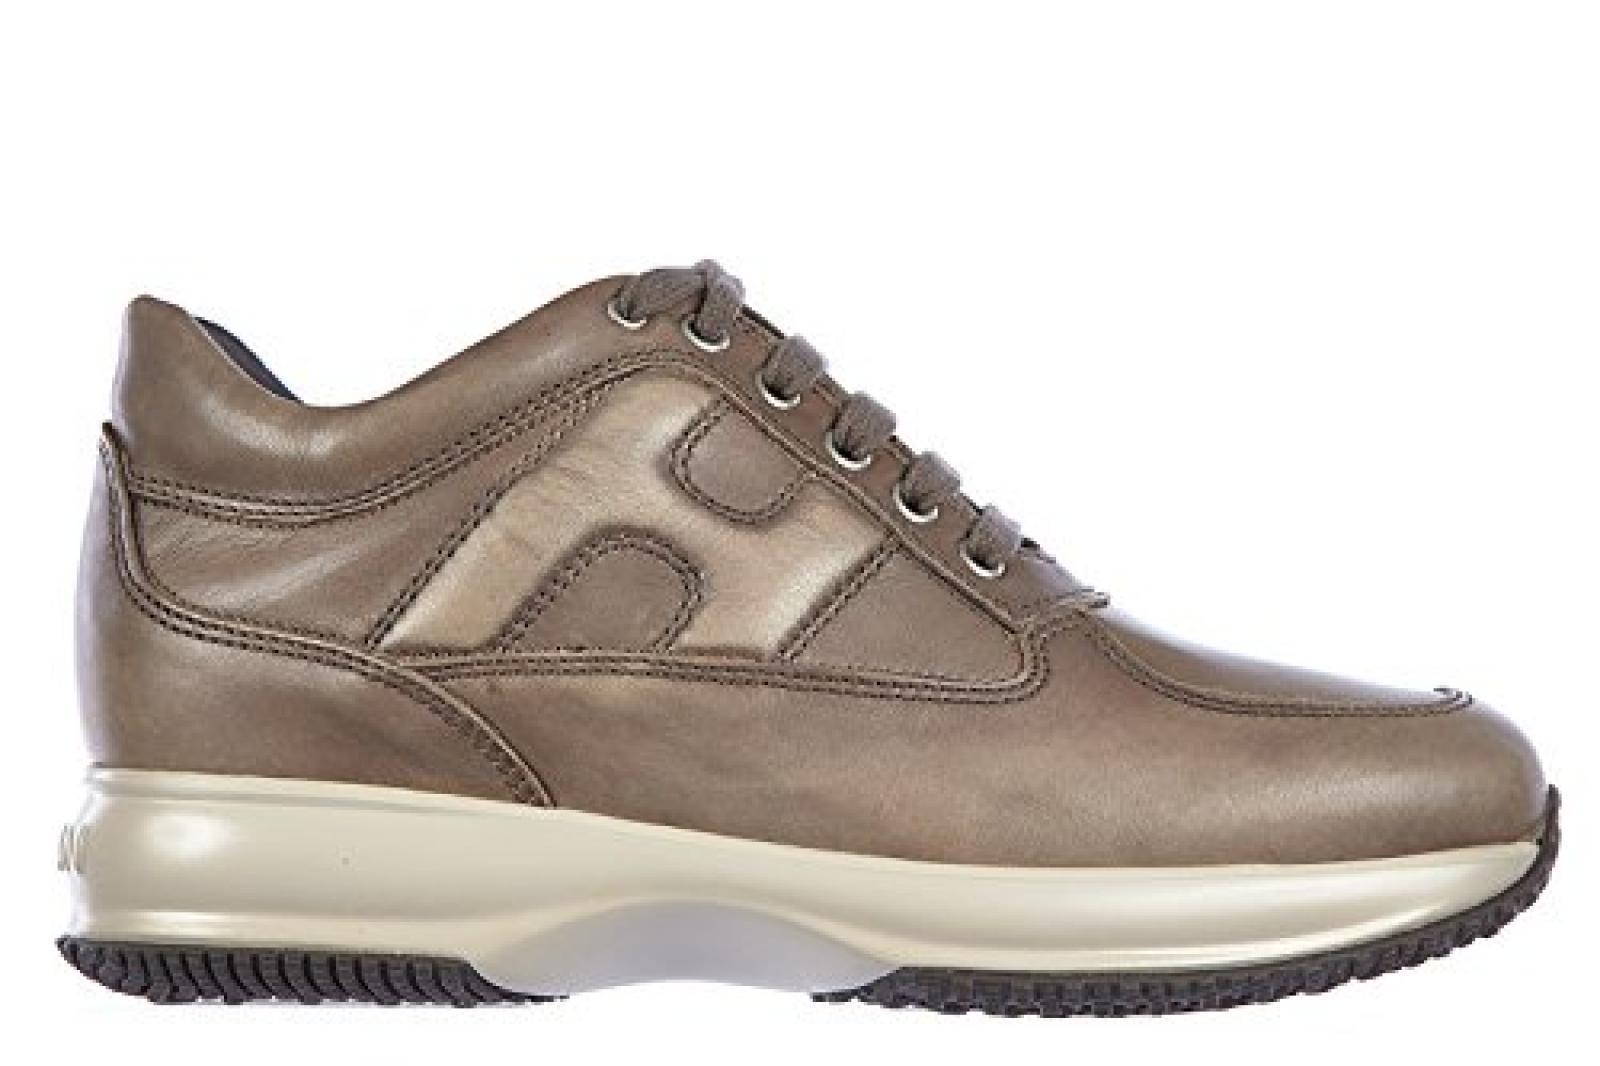 Hogan Herrenschuhe Herren Leder Schuhe Sneakers interactive Braun